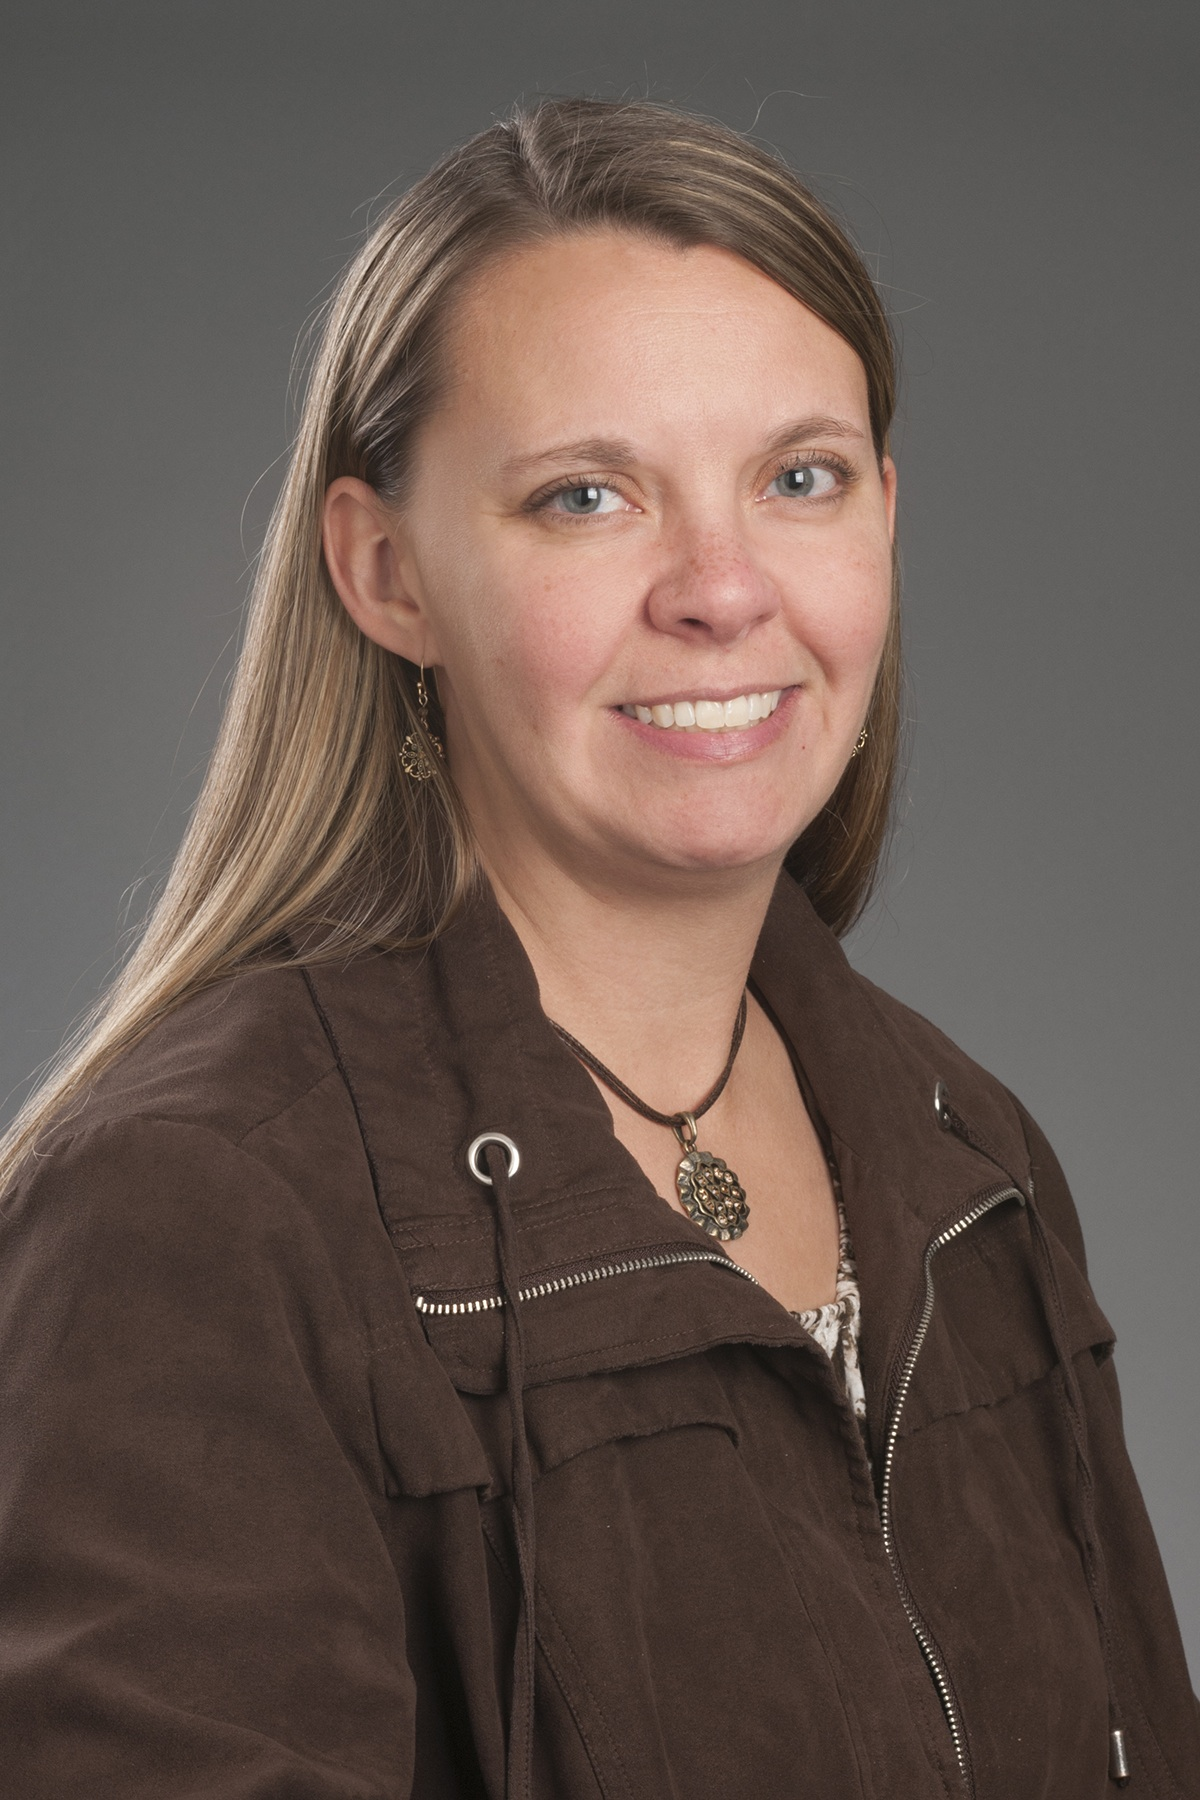 Rochelle Wolfe, Health Services, studio portrait